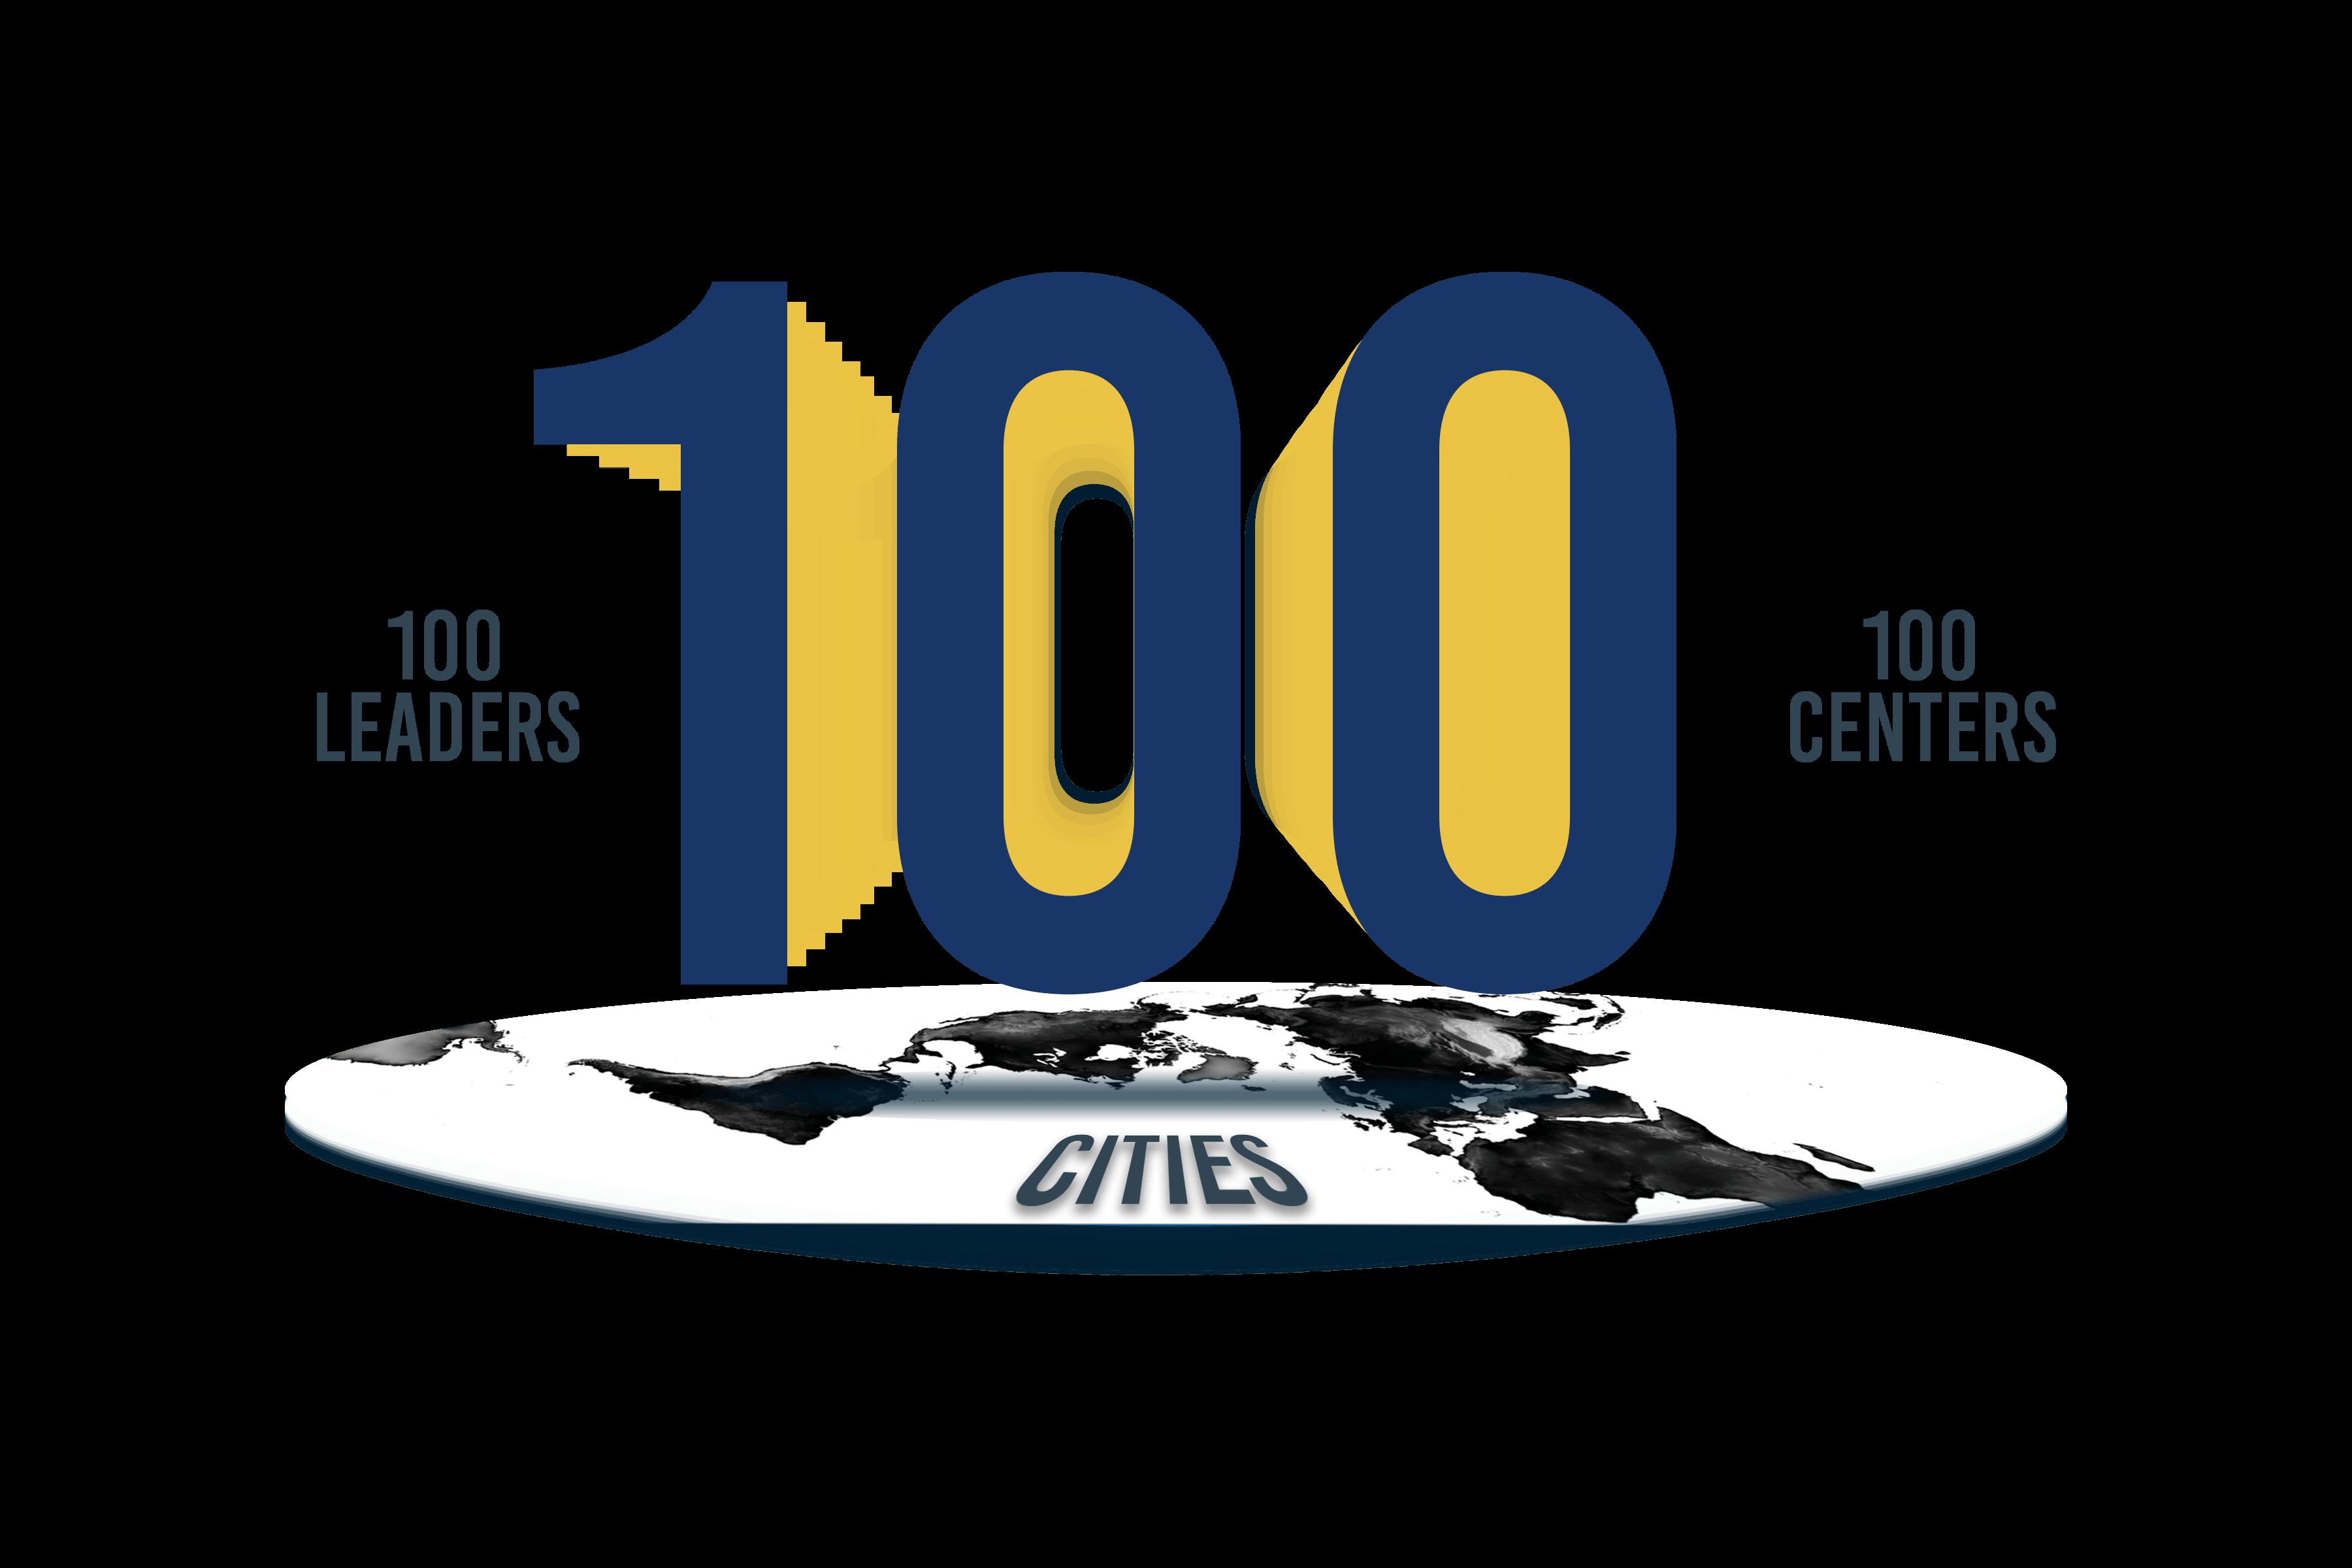 100 centers